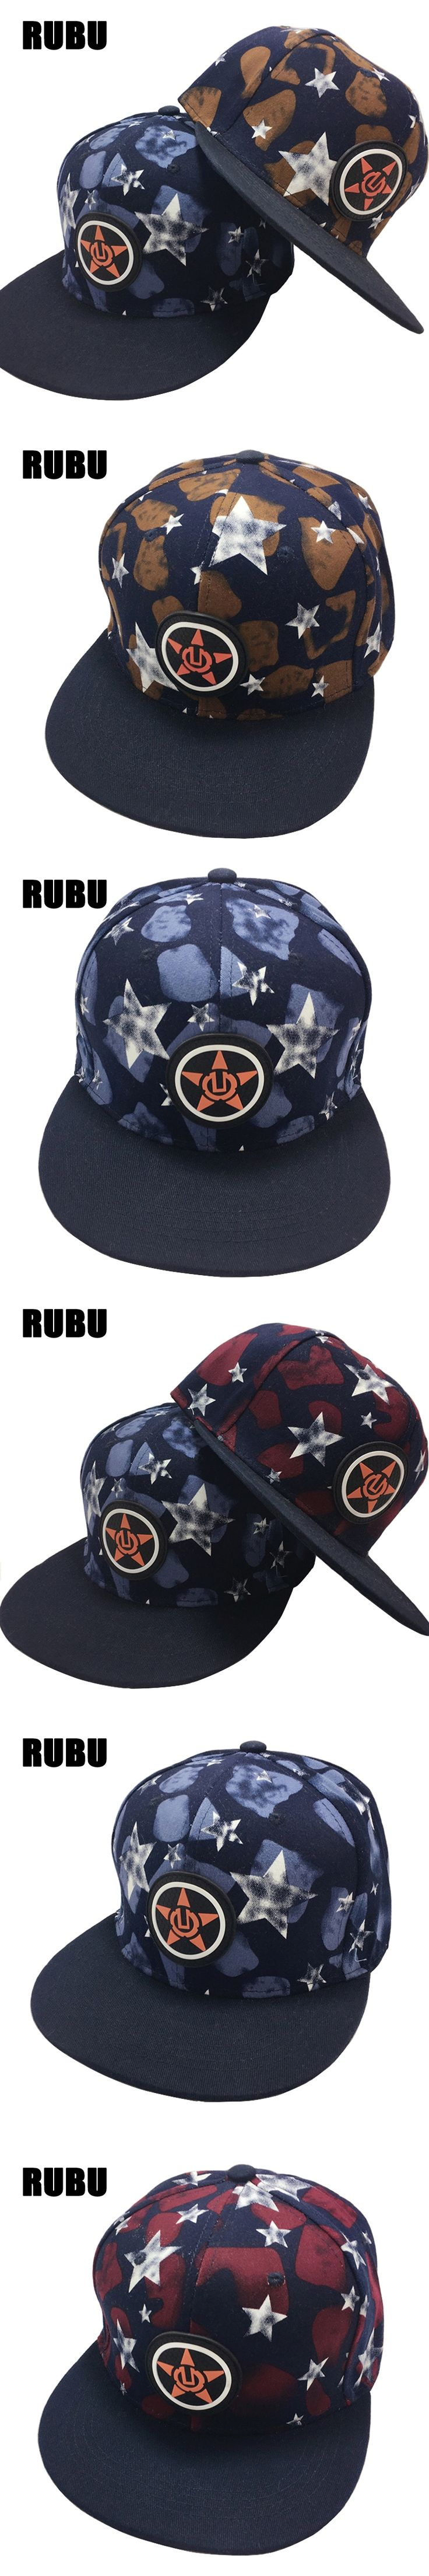 Fashion star logo Snapback Hats men Bone Snap Back gorras Men Hip Hop Cap Fitted Baseball Cap k pop Flat-brimmed Hat Star hats